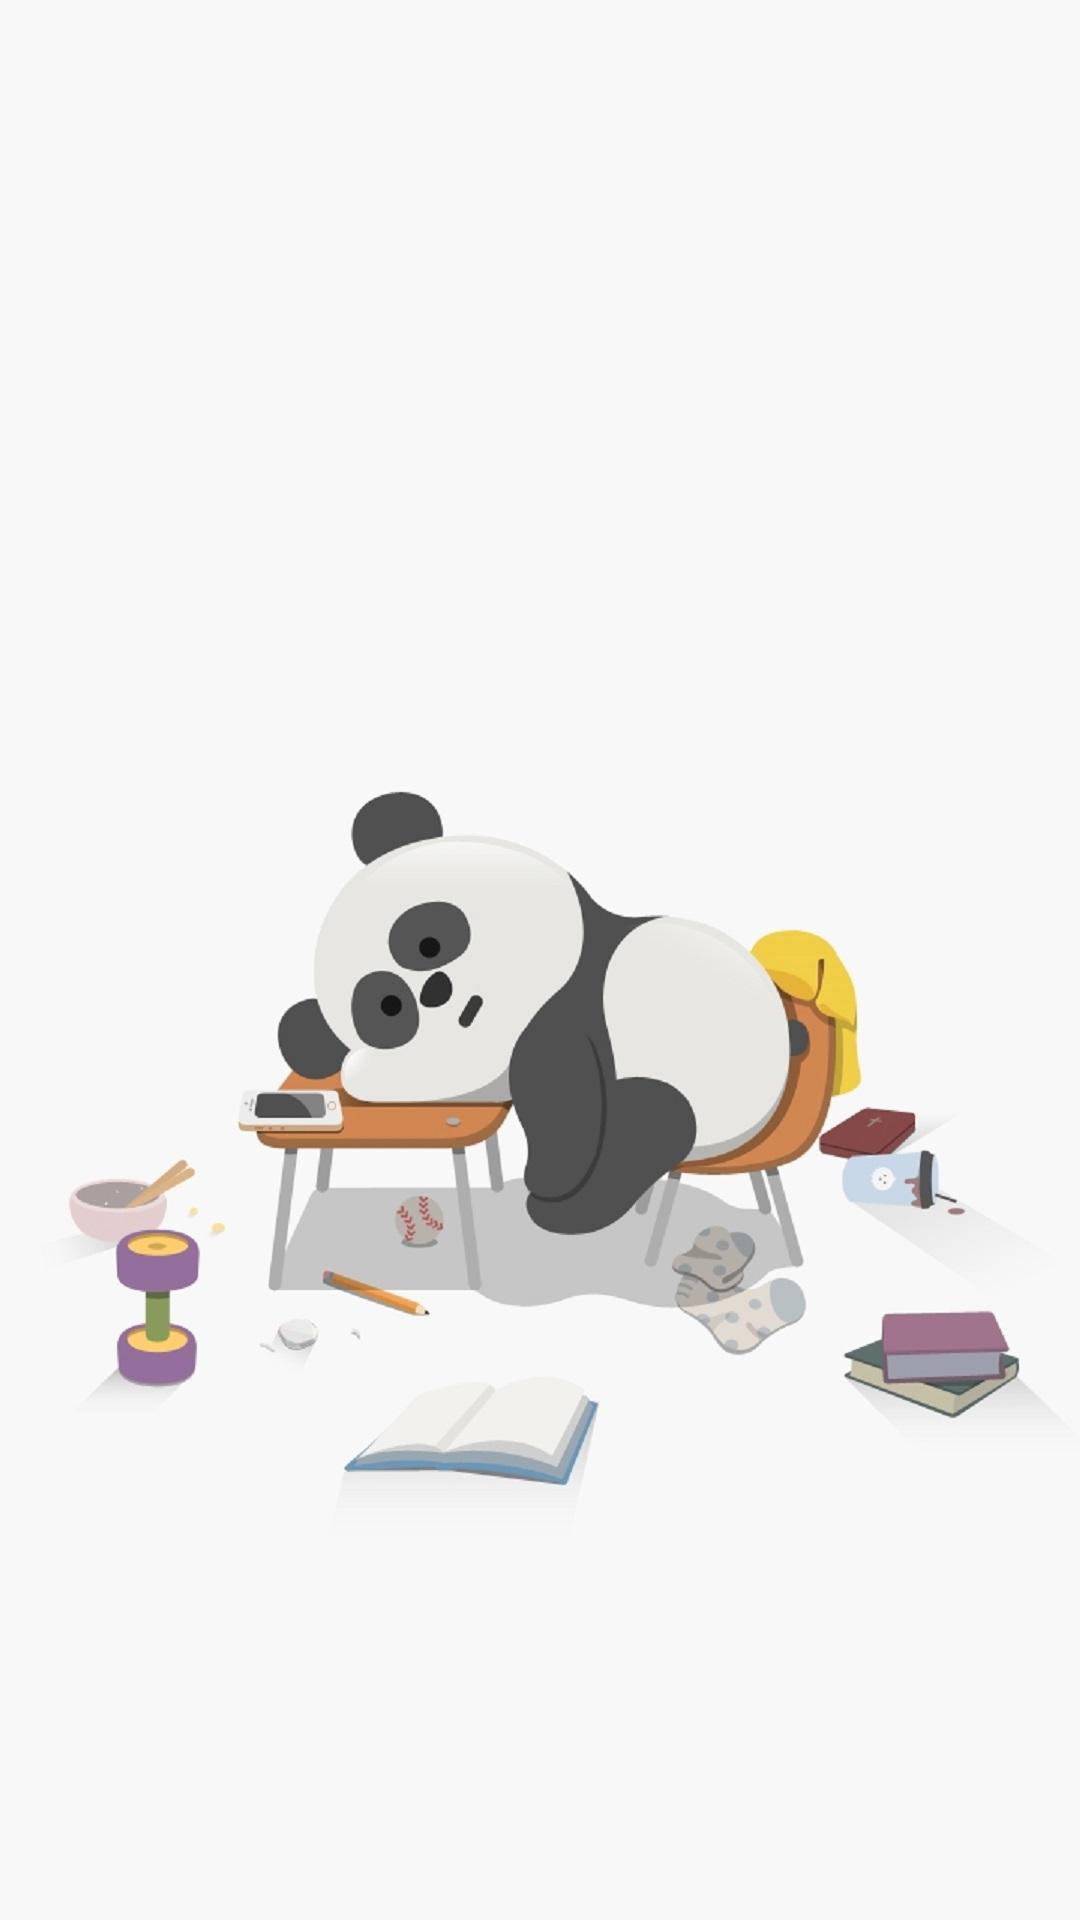 Cute-Sleepy-Panda-Cute-Animal-iPhone-Tap-to-see-more-high-quality-iphone-ba-wallpaper-wp3604487